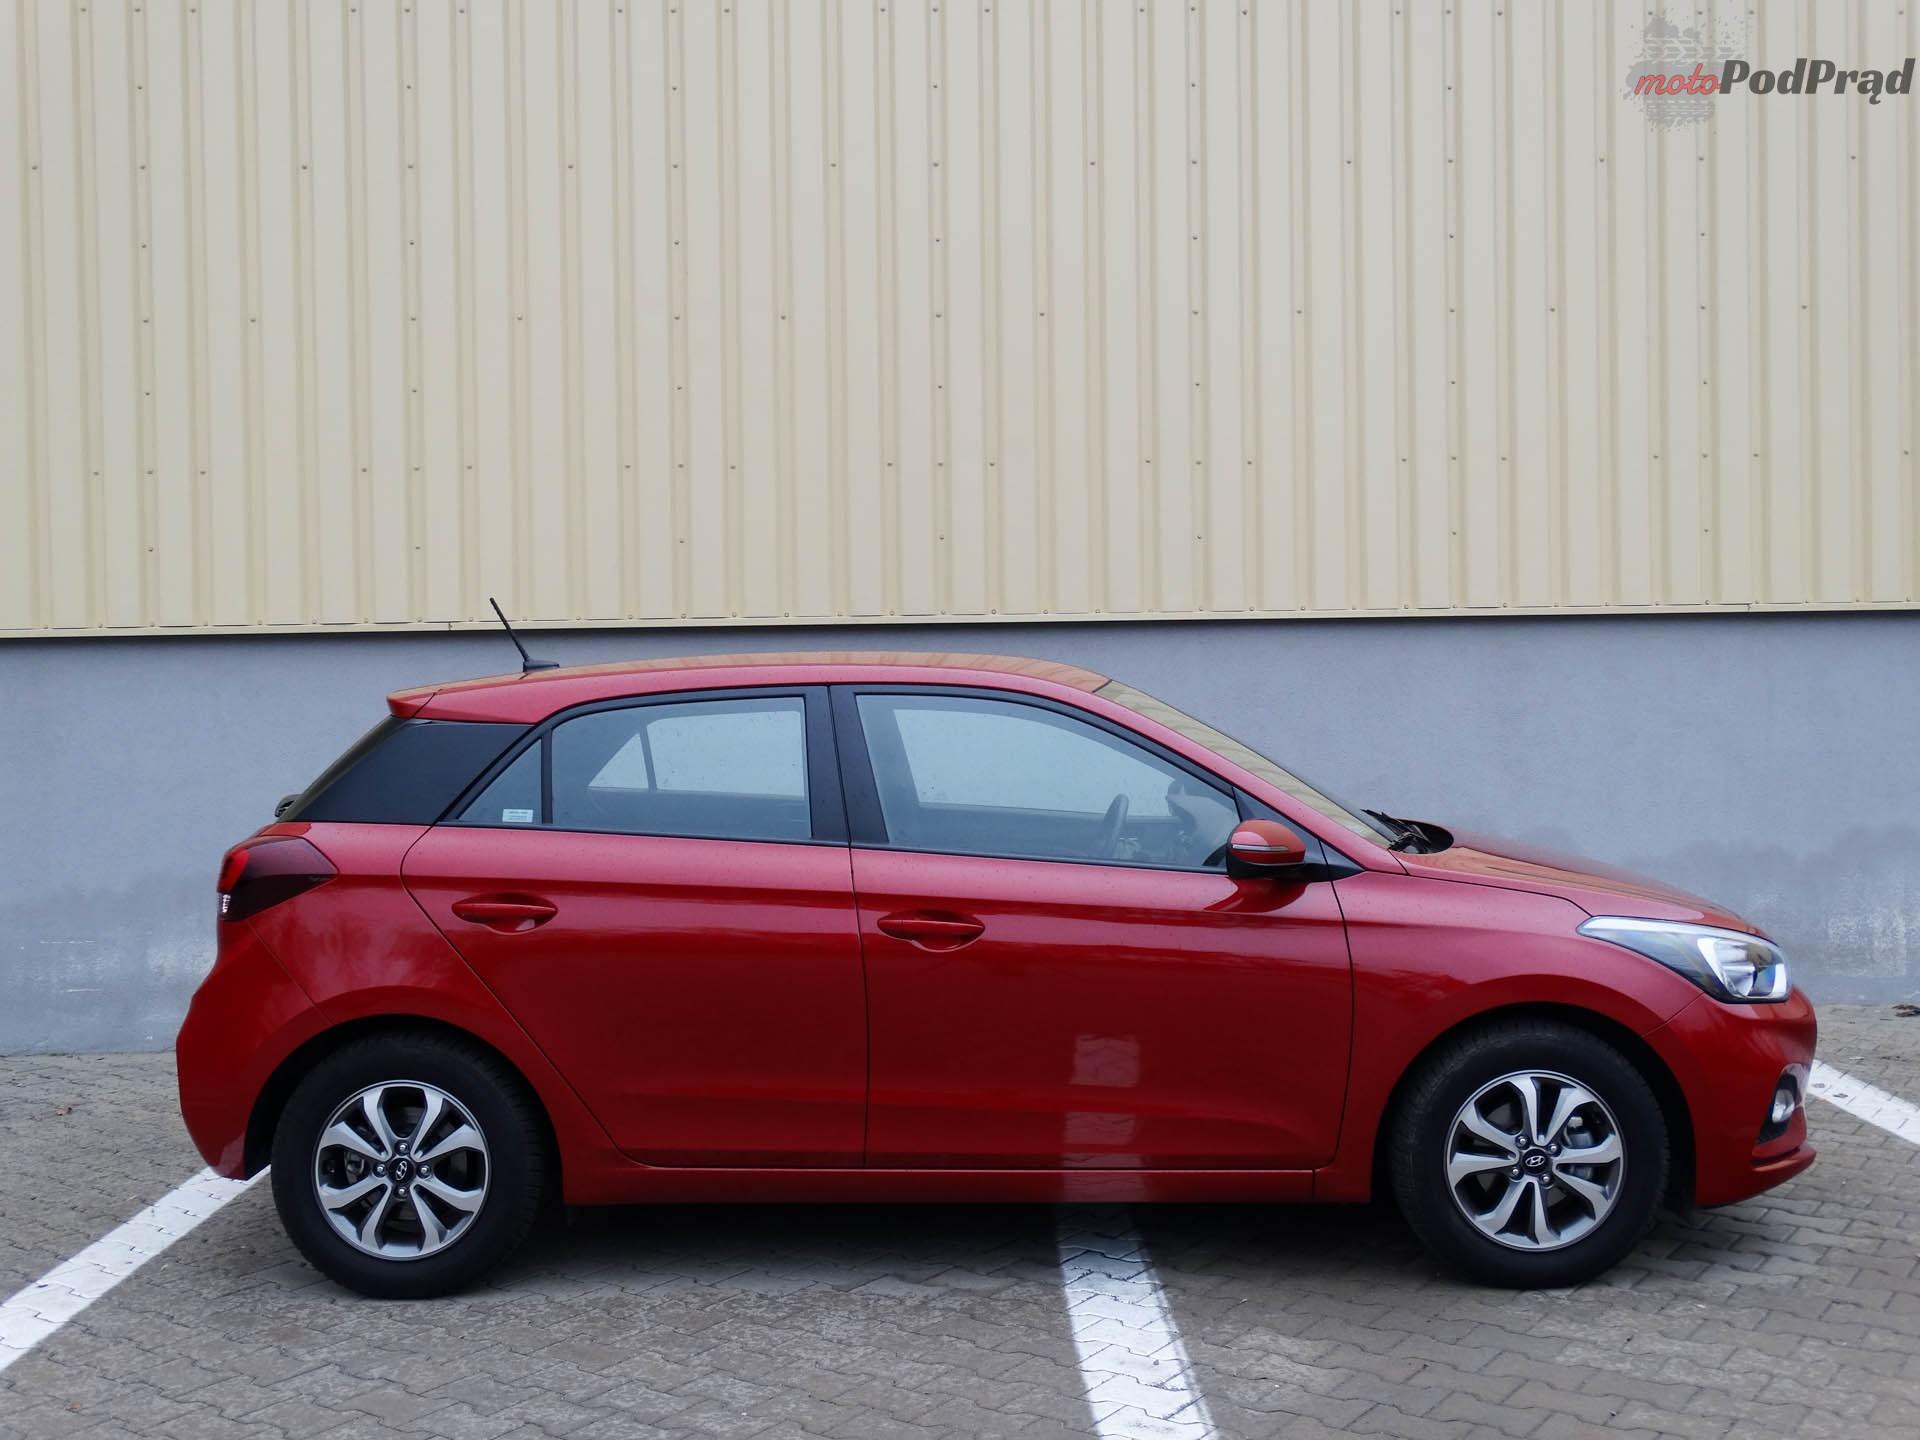 hyundai i20 1 Test: Hyundai i20 1.2 MPI 84 KM   nie tylko miejski